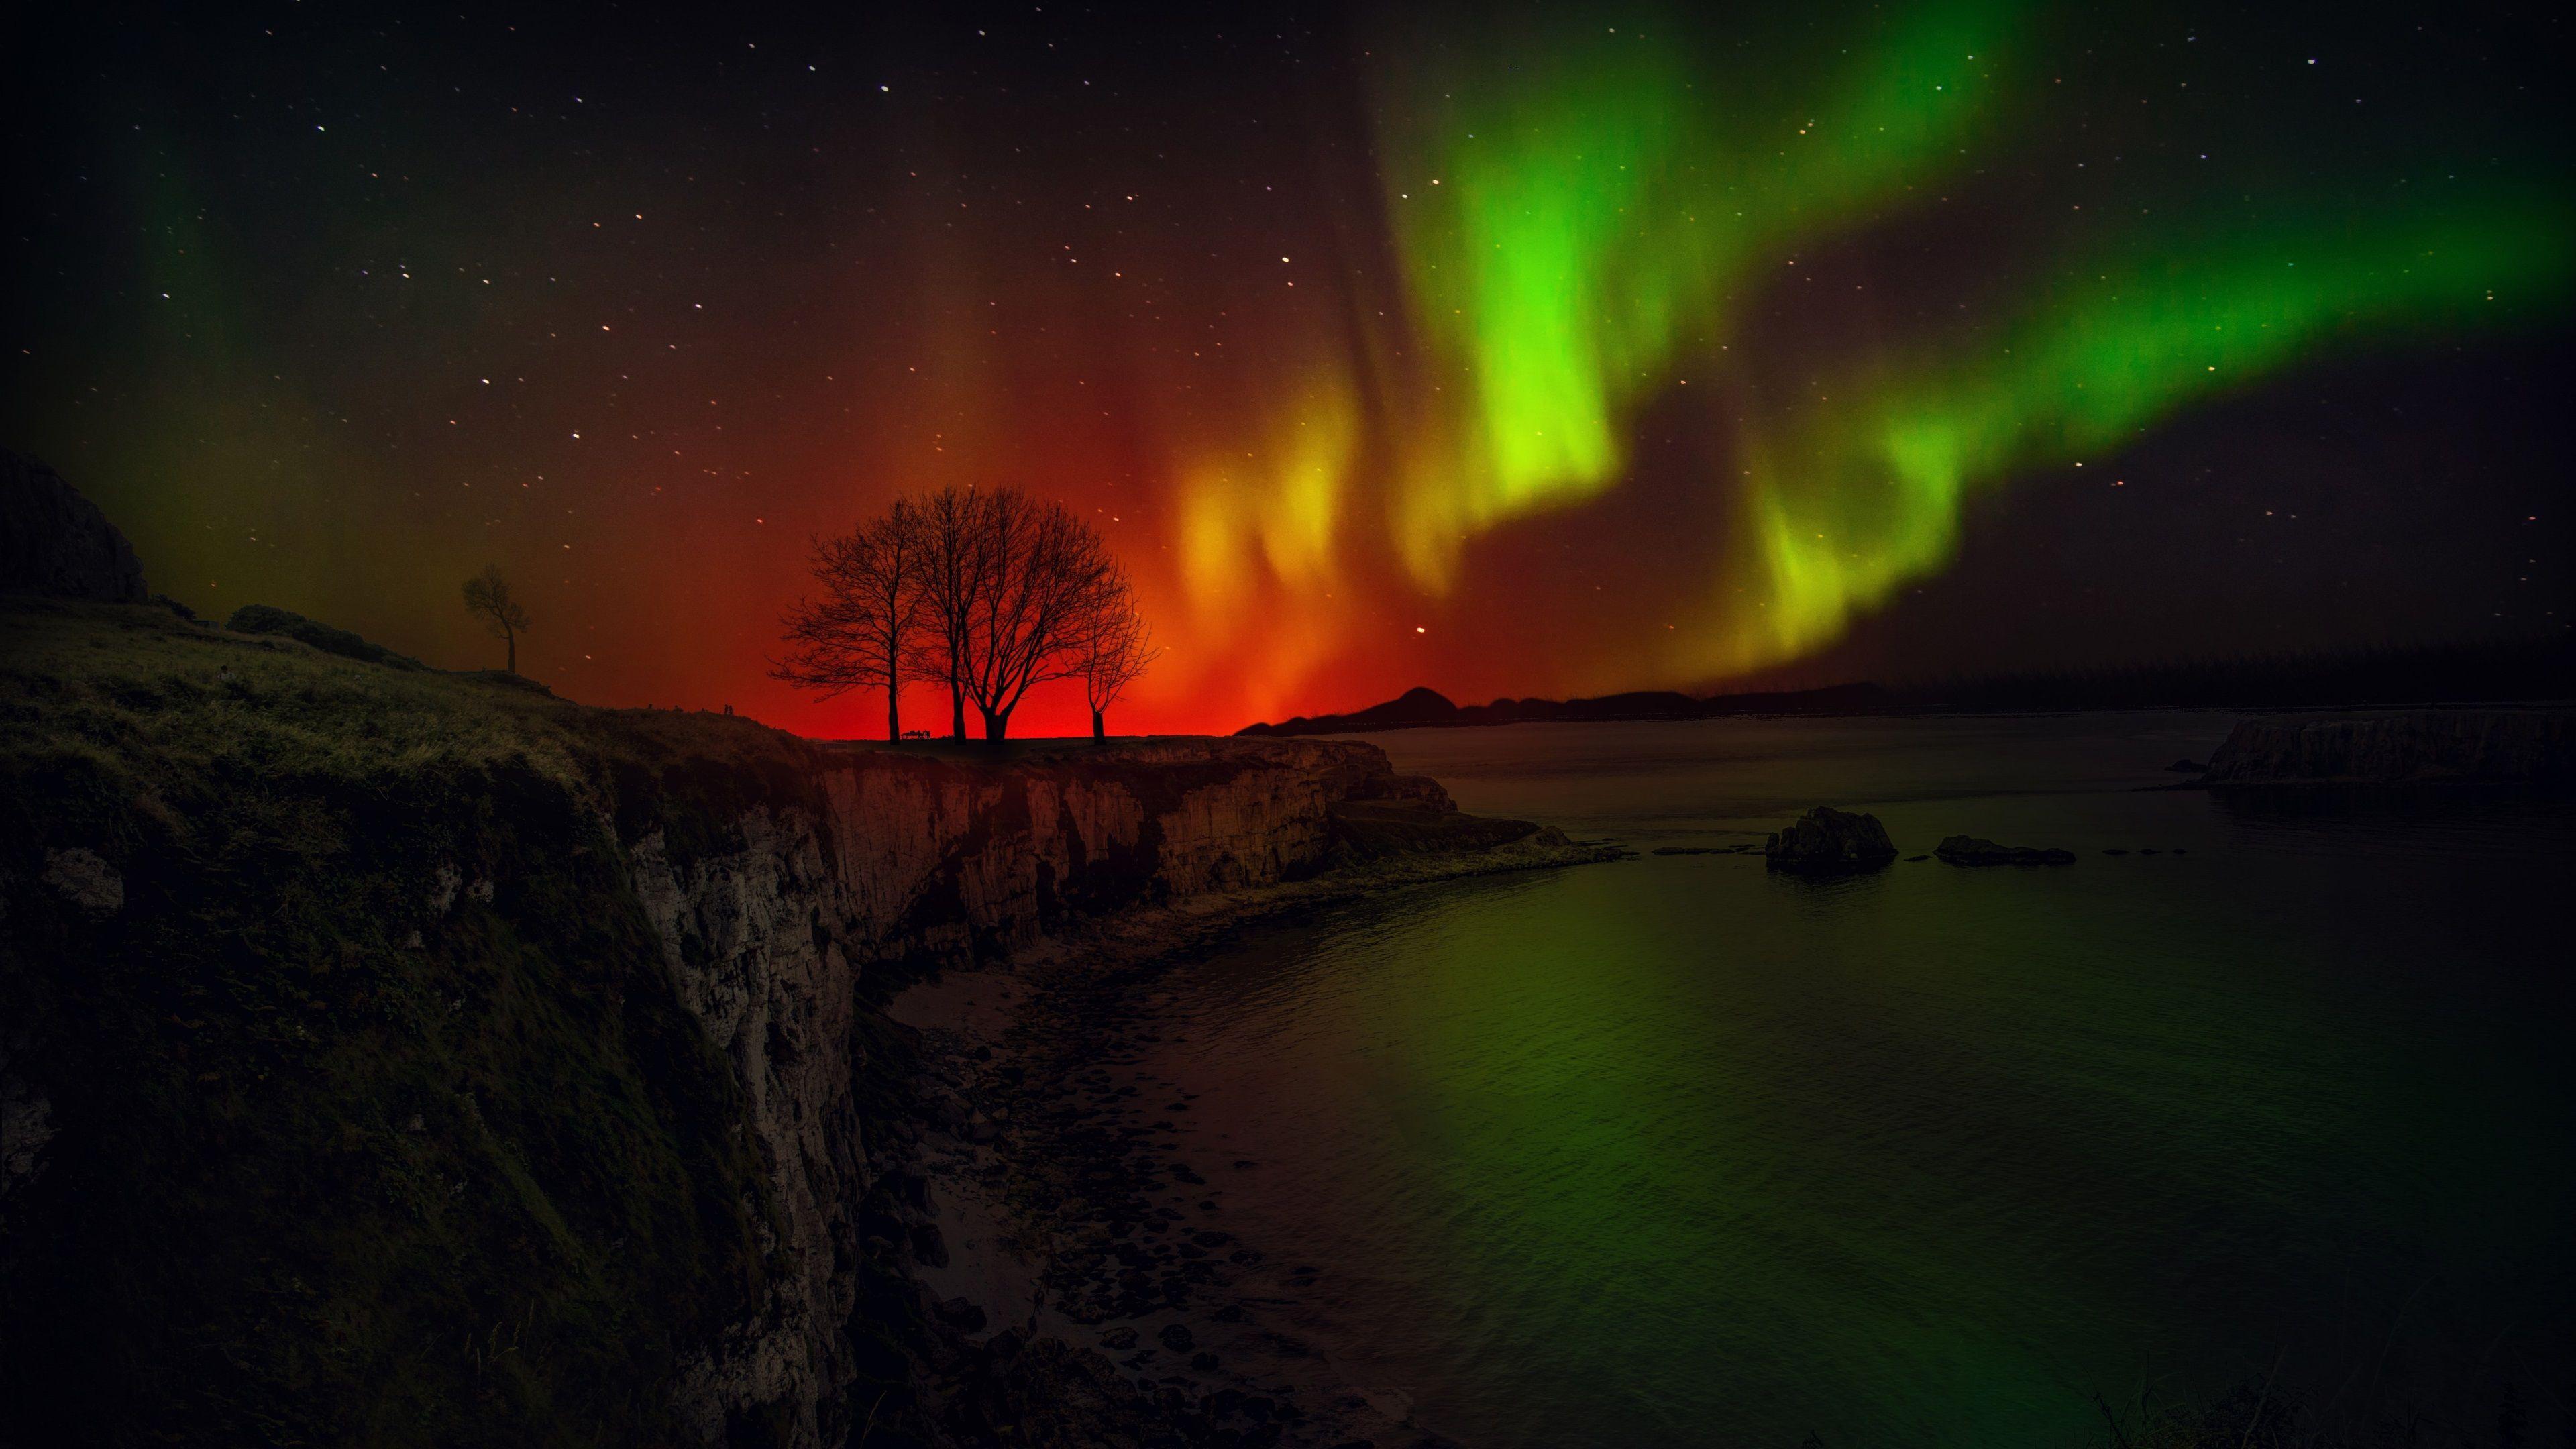 Desktop Aurora Borealis Wallpapers - Wallpaper Cave